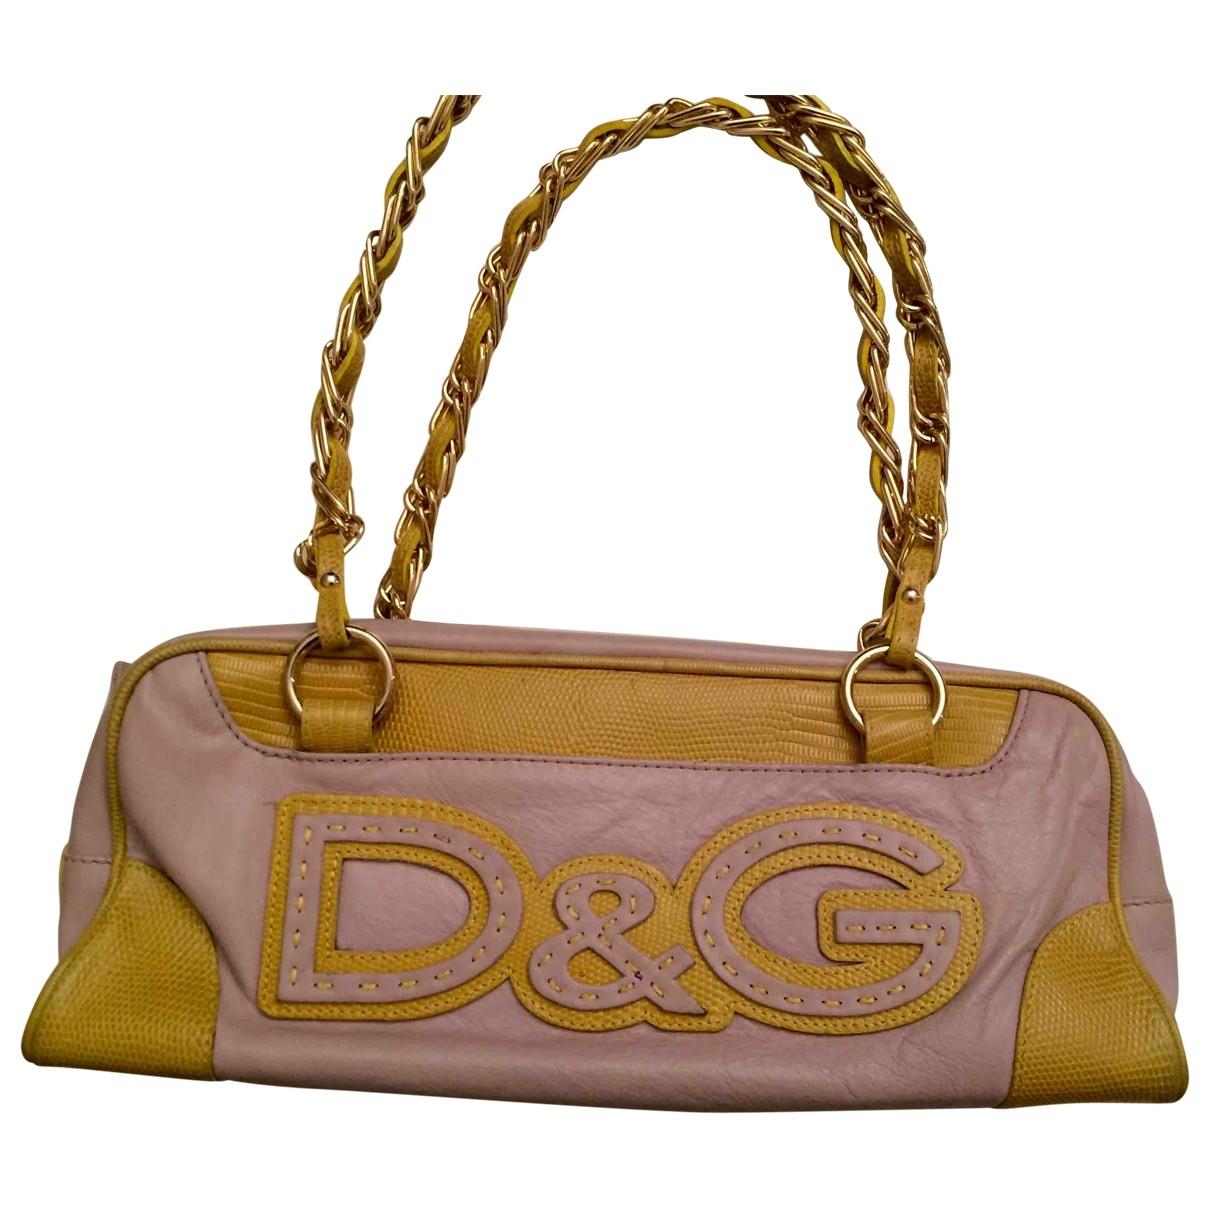 Dolce & Gabbana \N Purple Leather handbag for Women \N